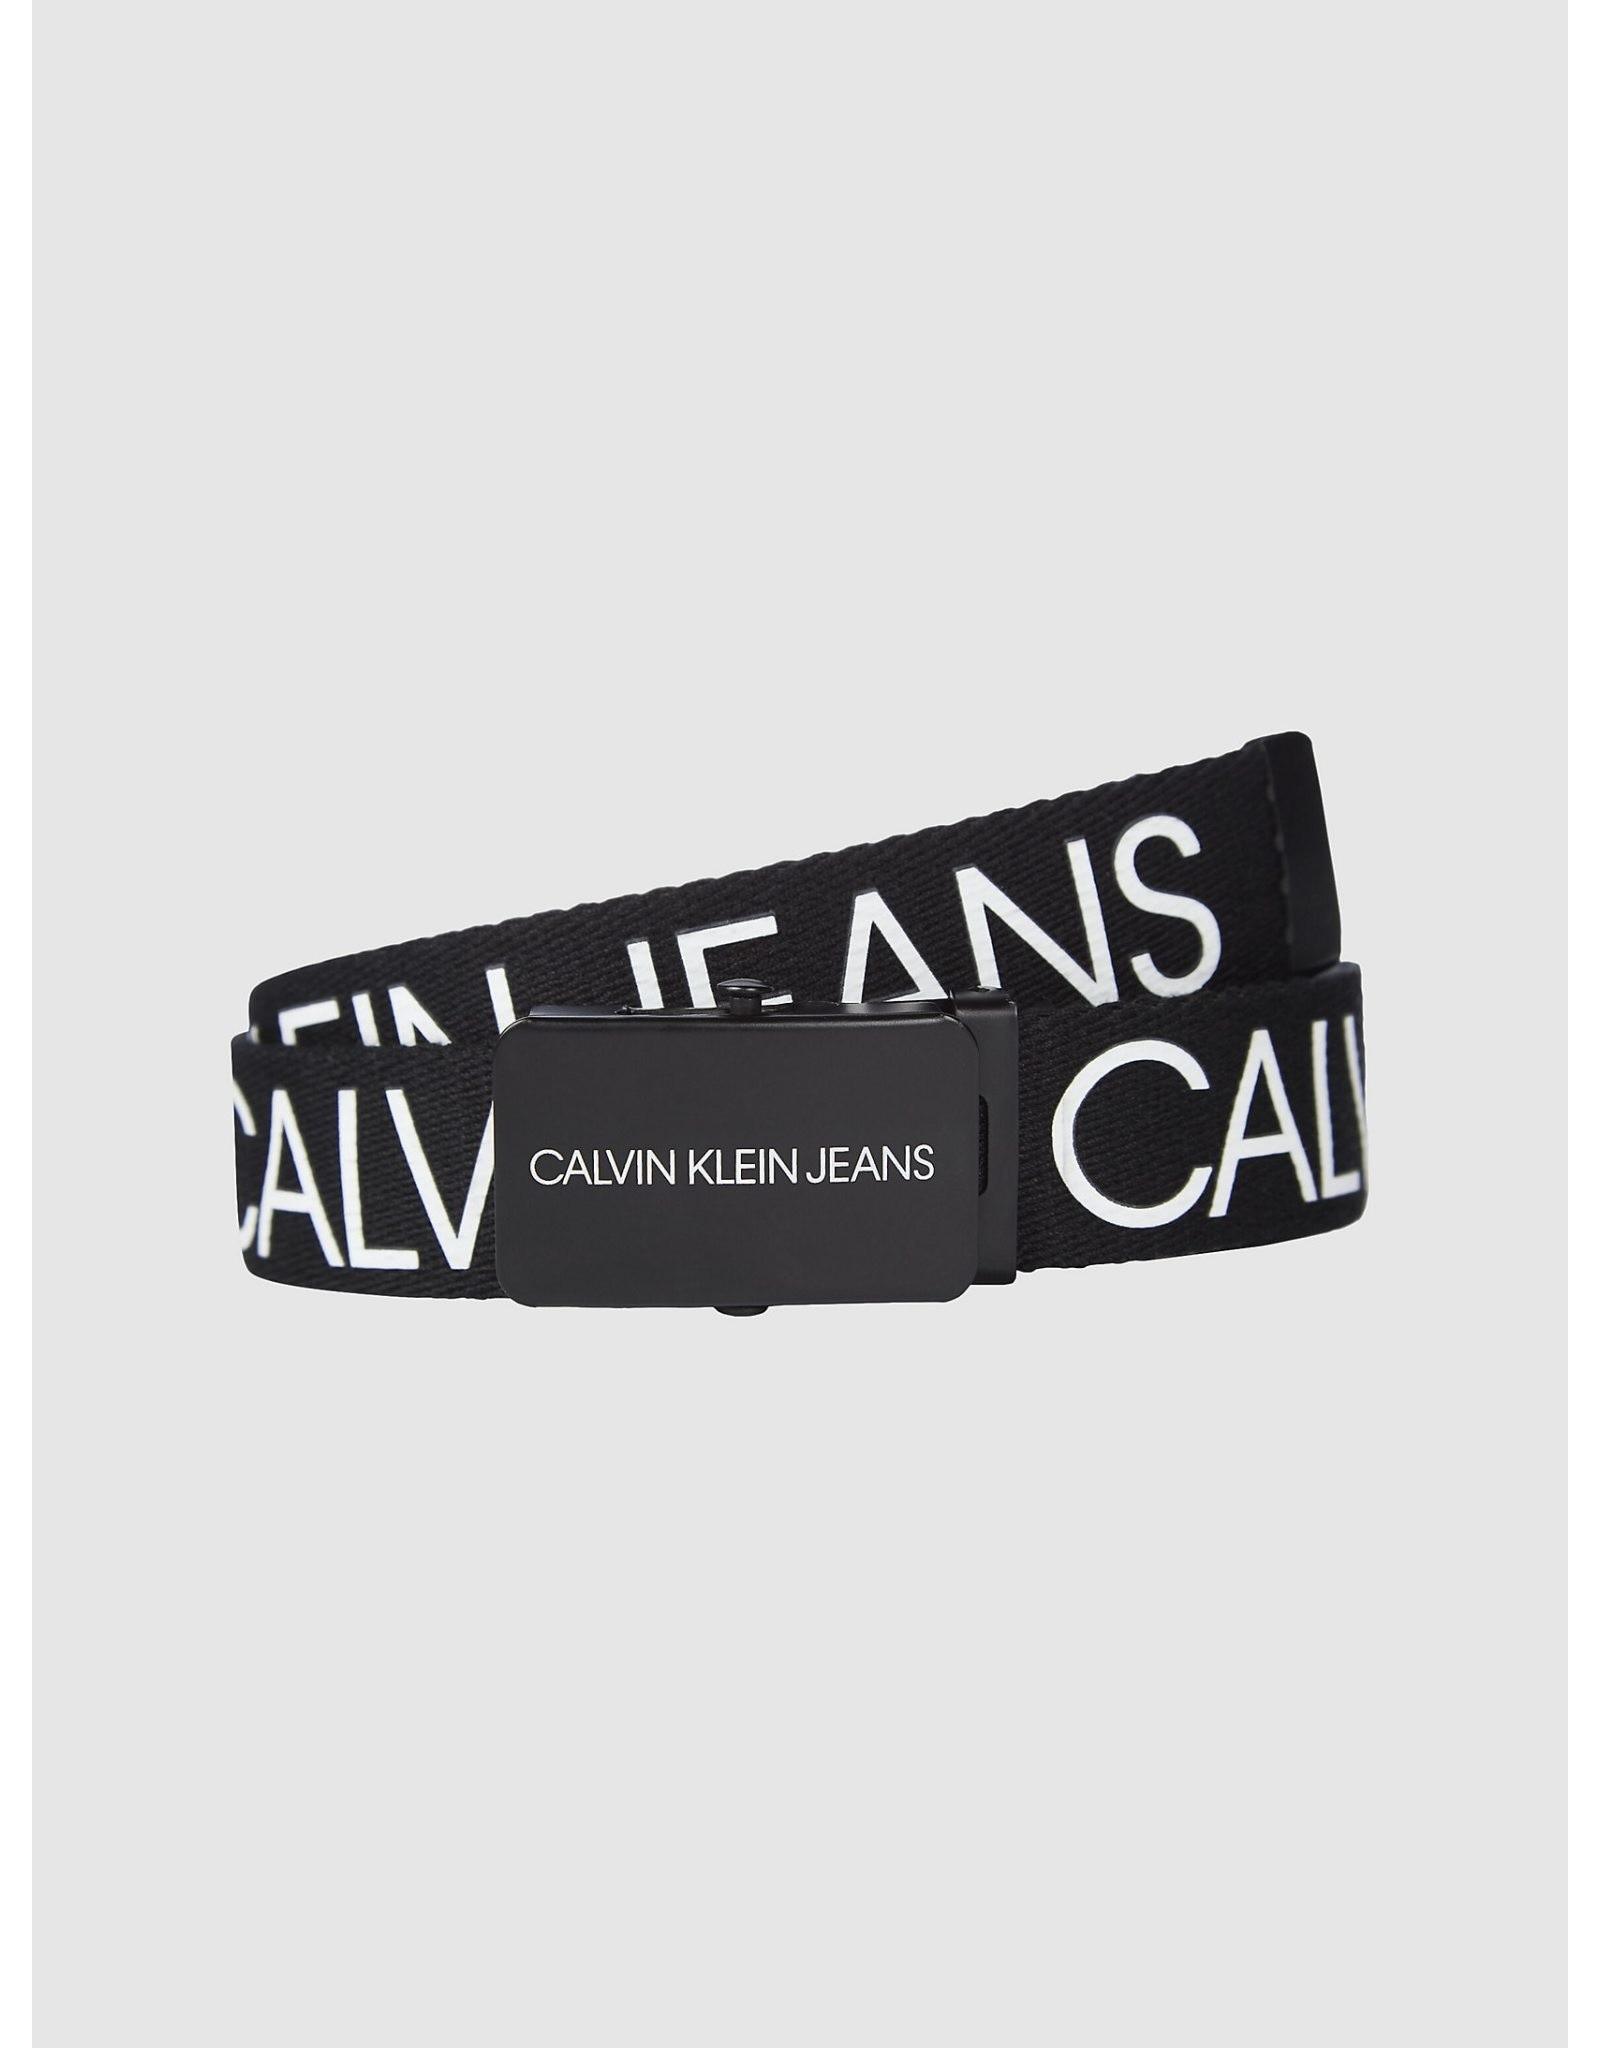 Calvin Klein 00125 riem